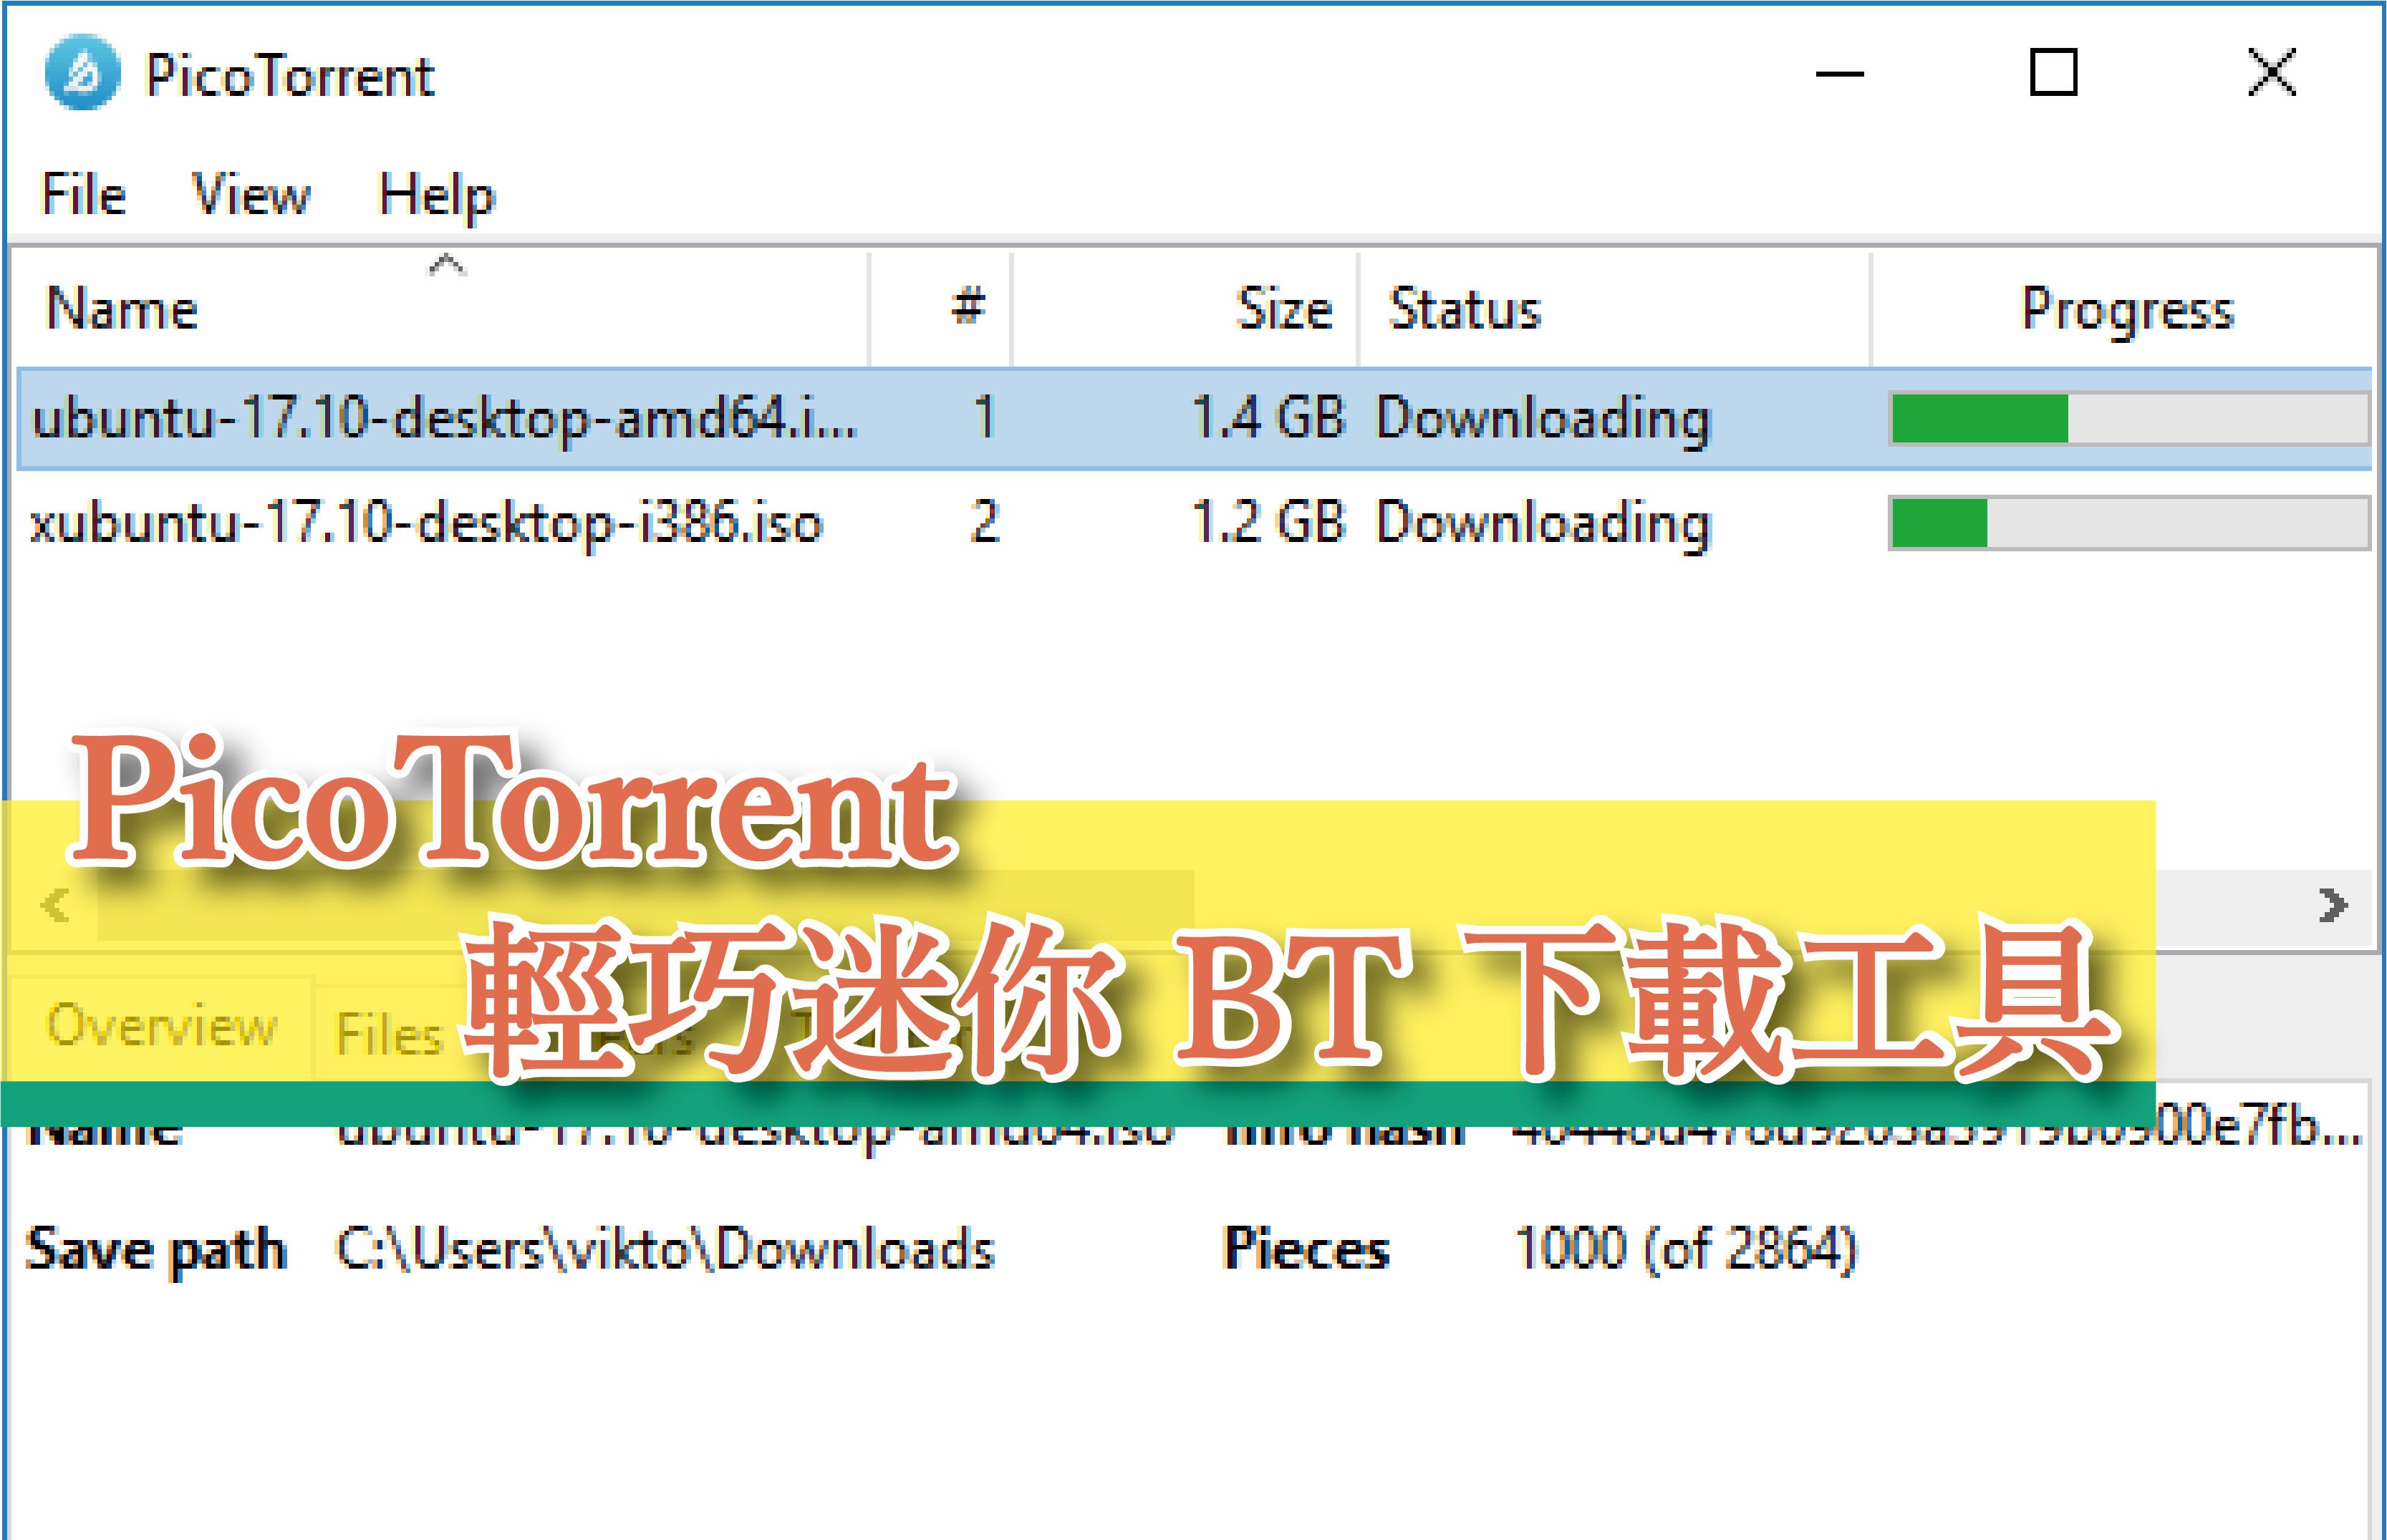 【Windows APP】PicoTorrent 輕巧迷你的 BT 下載工具